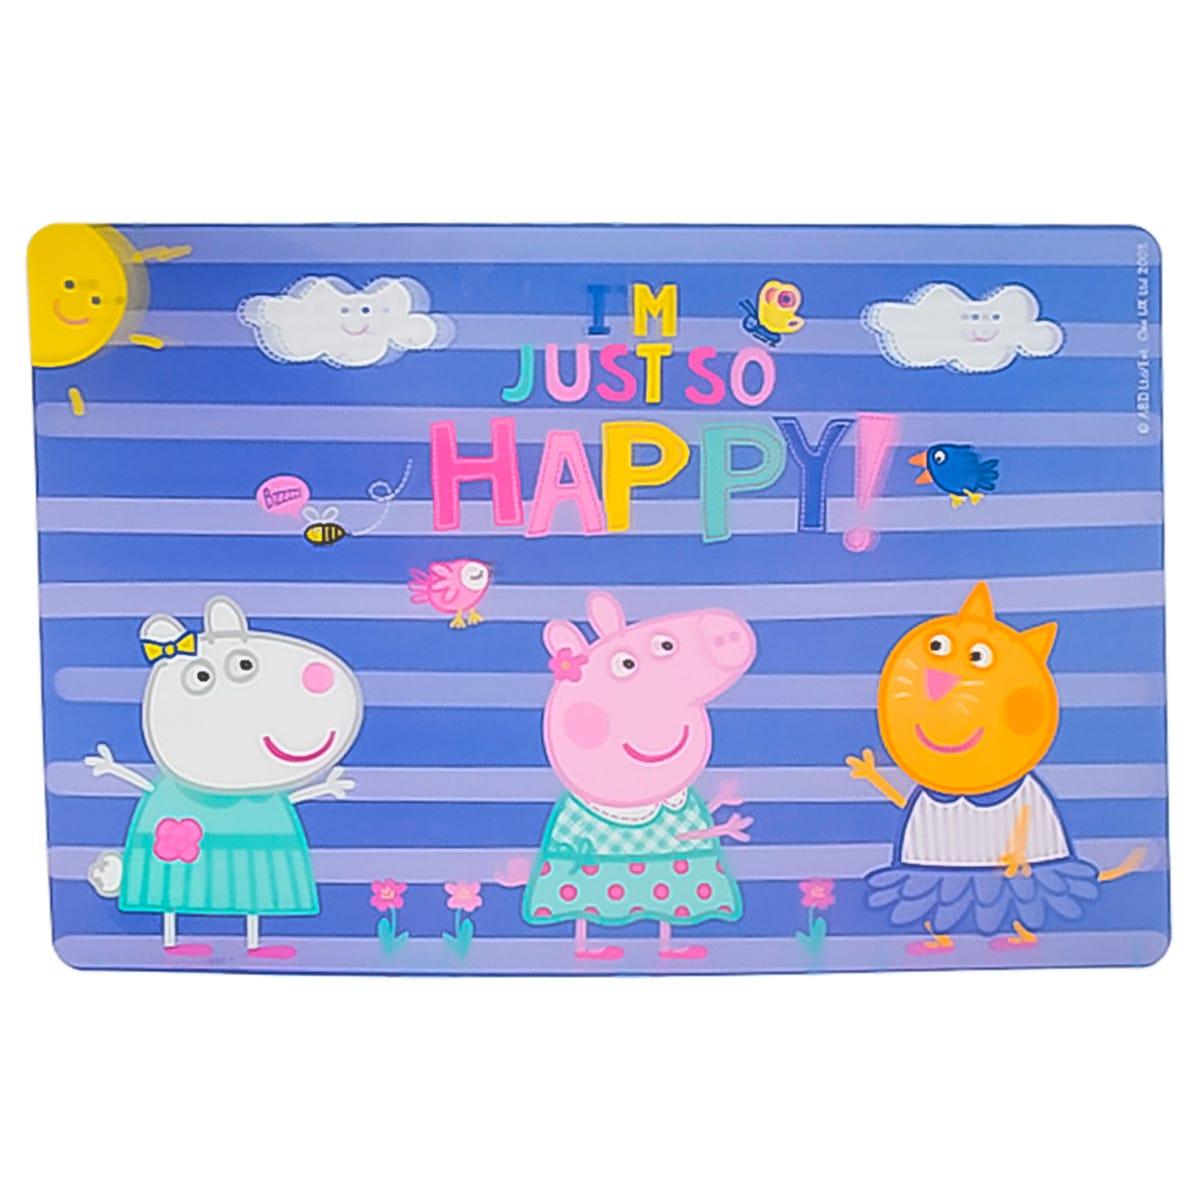 Mantel para niños Fun Kids® de Peppa Pig tamaño estándar